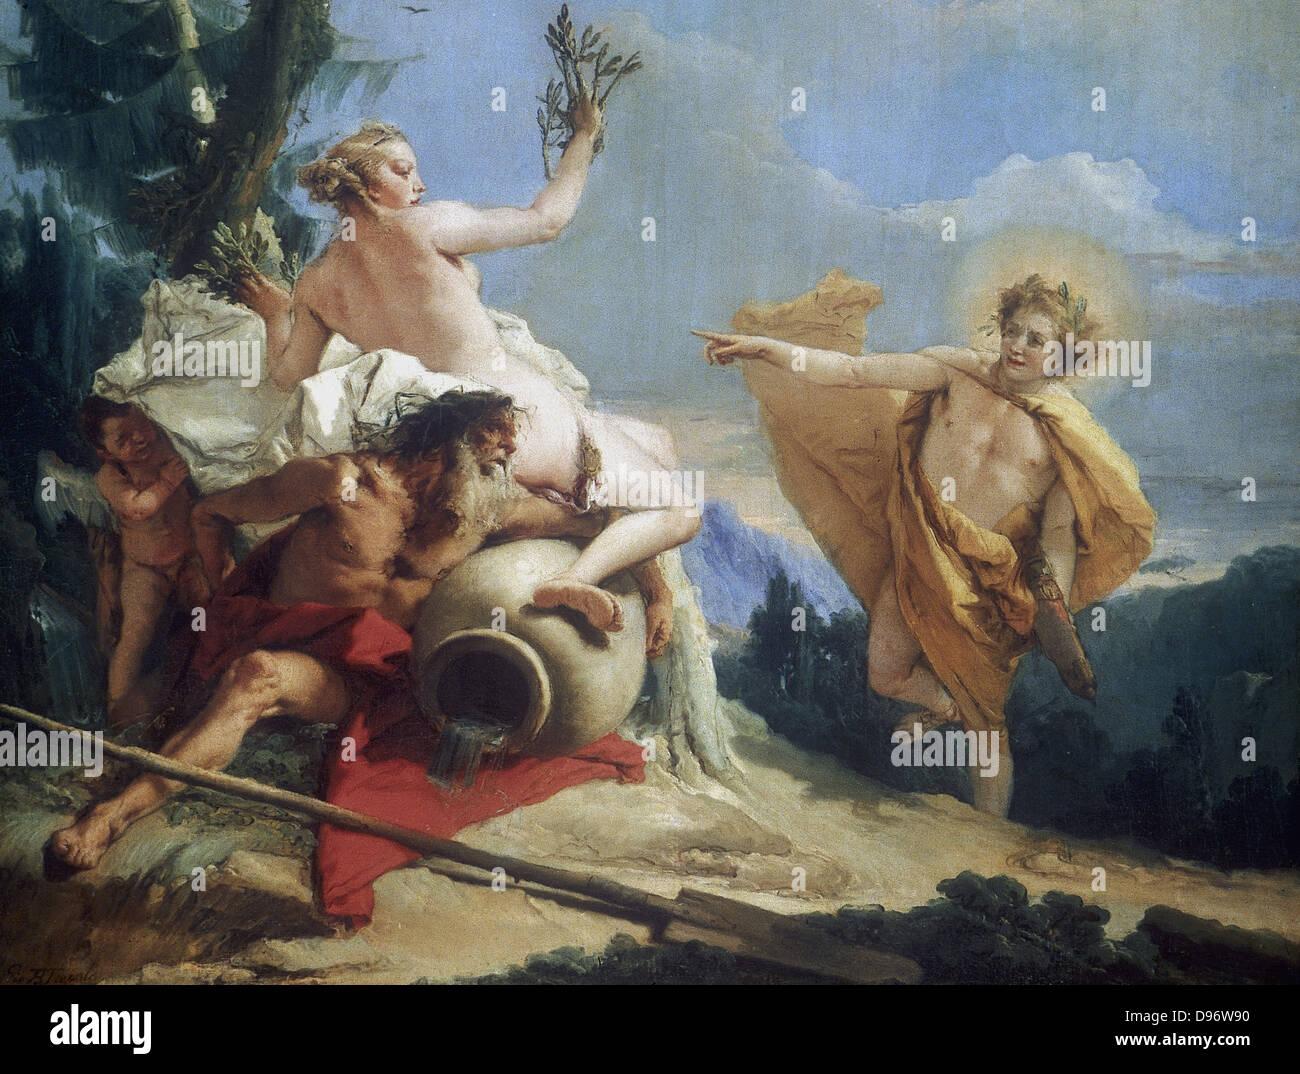 Apollo Pursuing Daphne' (c1755-1760). Greek mythology. Daphne, daughter of river god Peneus, dedicated to life - Stock Image